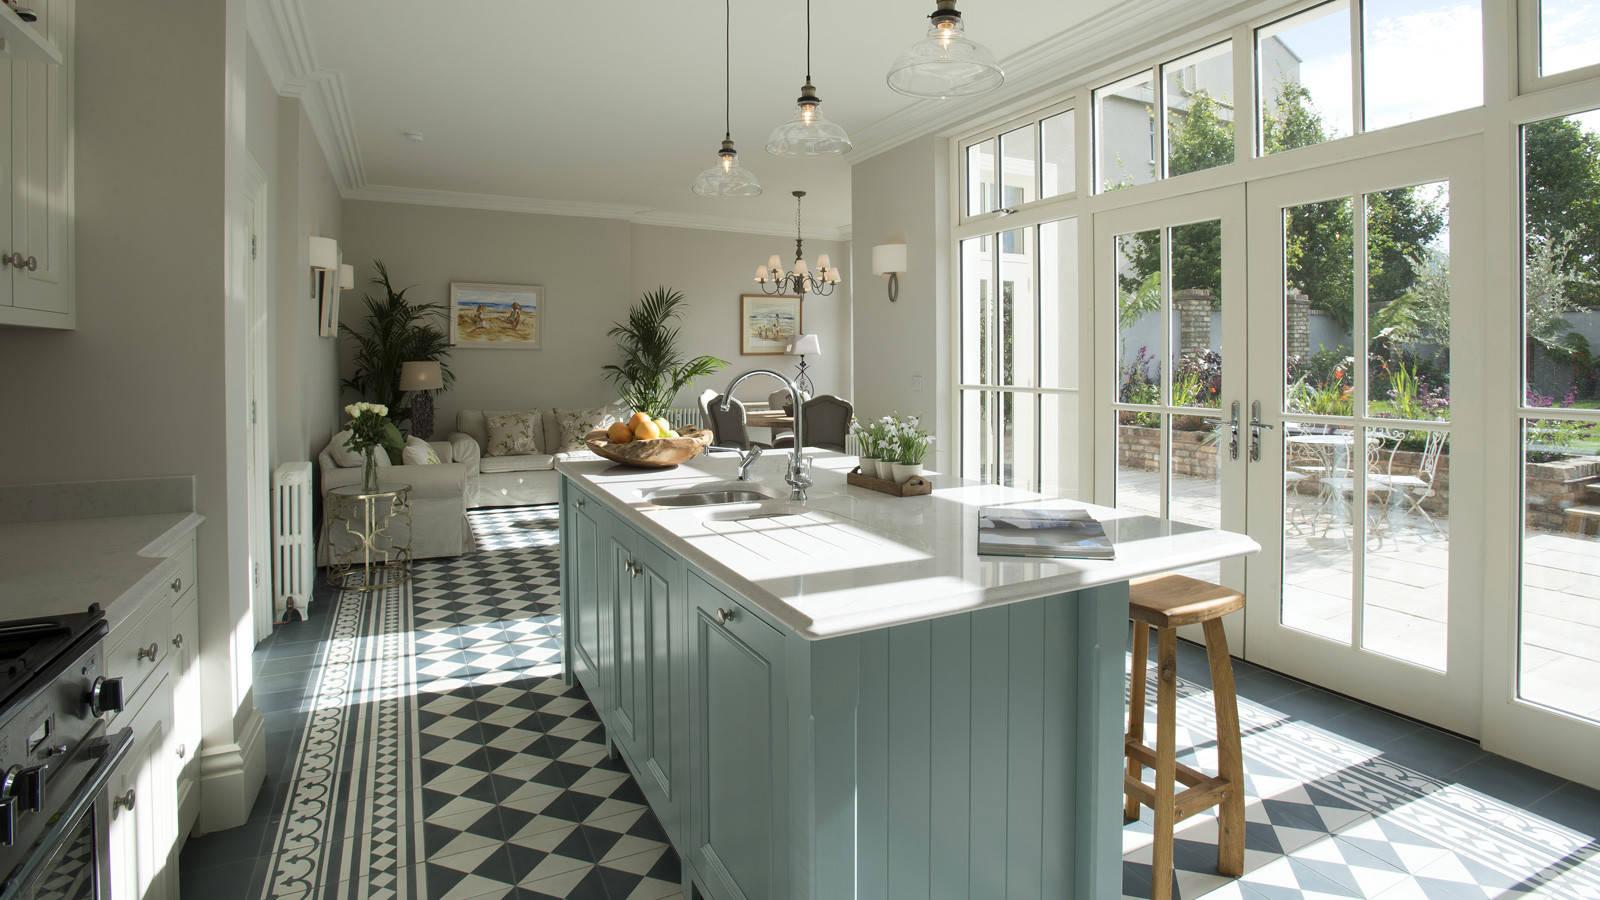 75 Beautiful Farmhouse Ceramic Tile Kitchen Pictures Ideas July 2021 Houzz